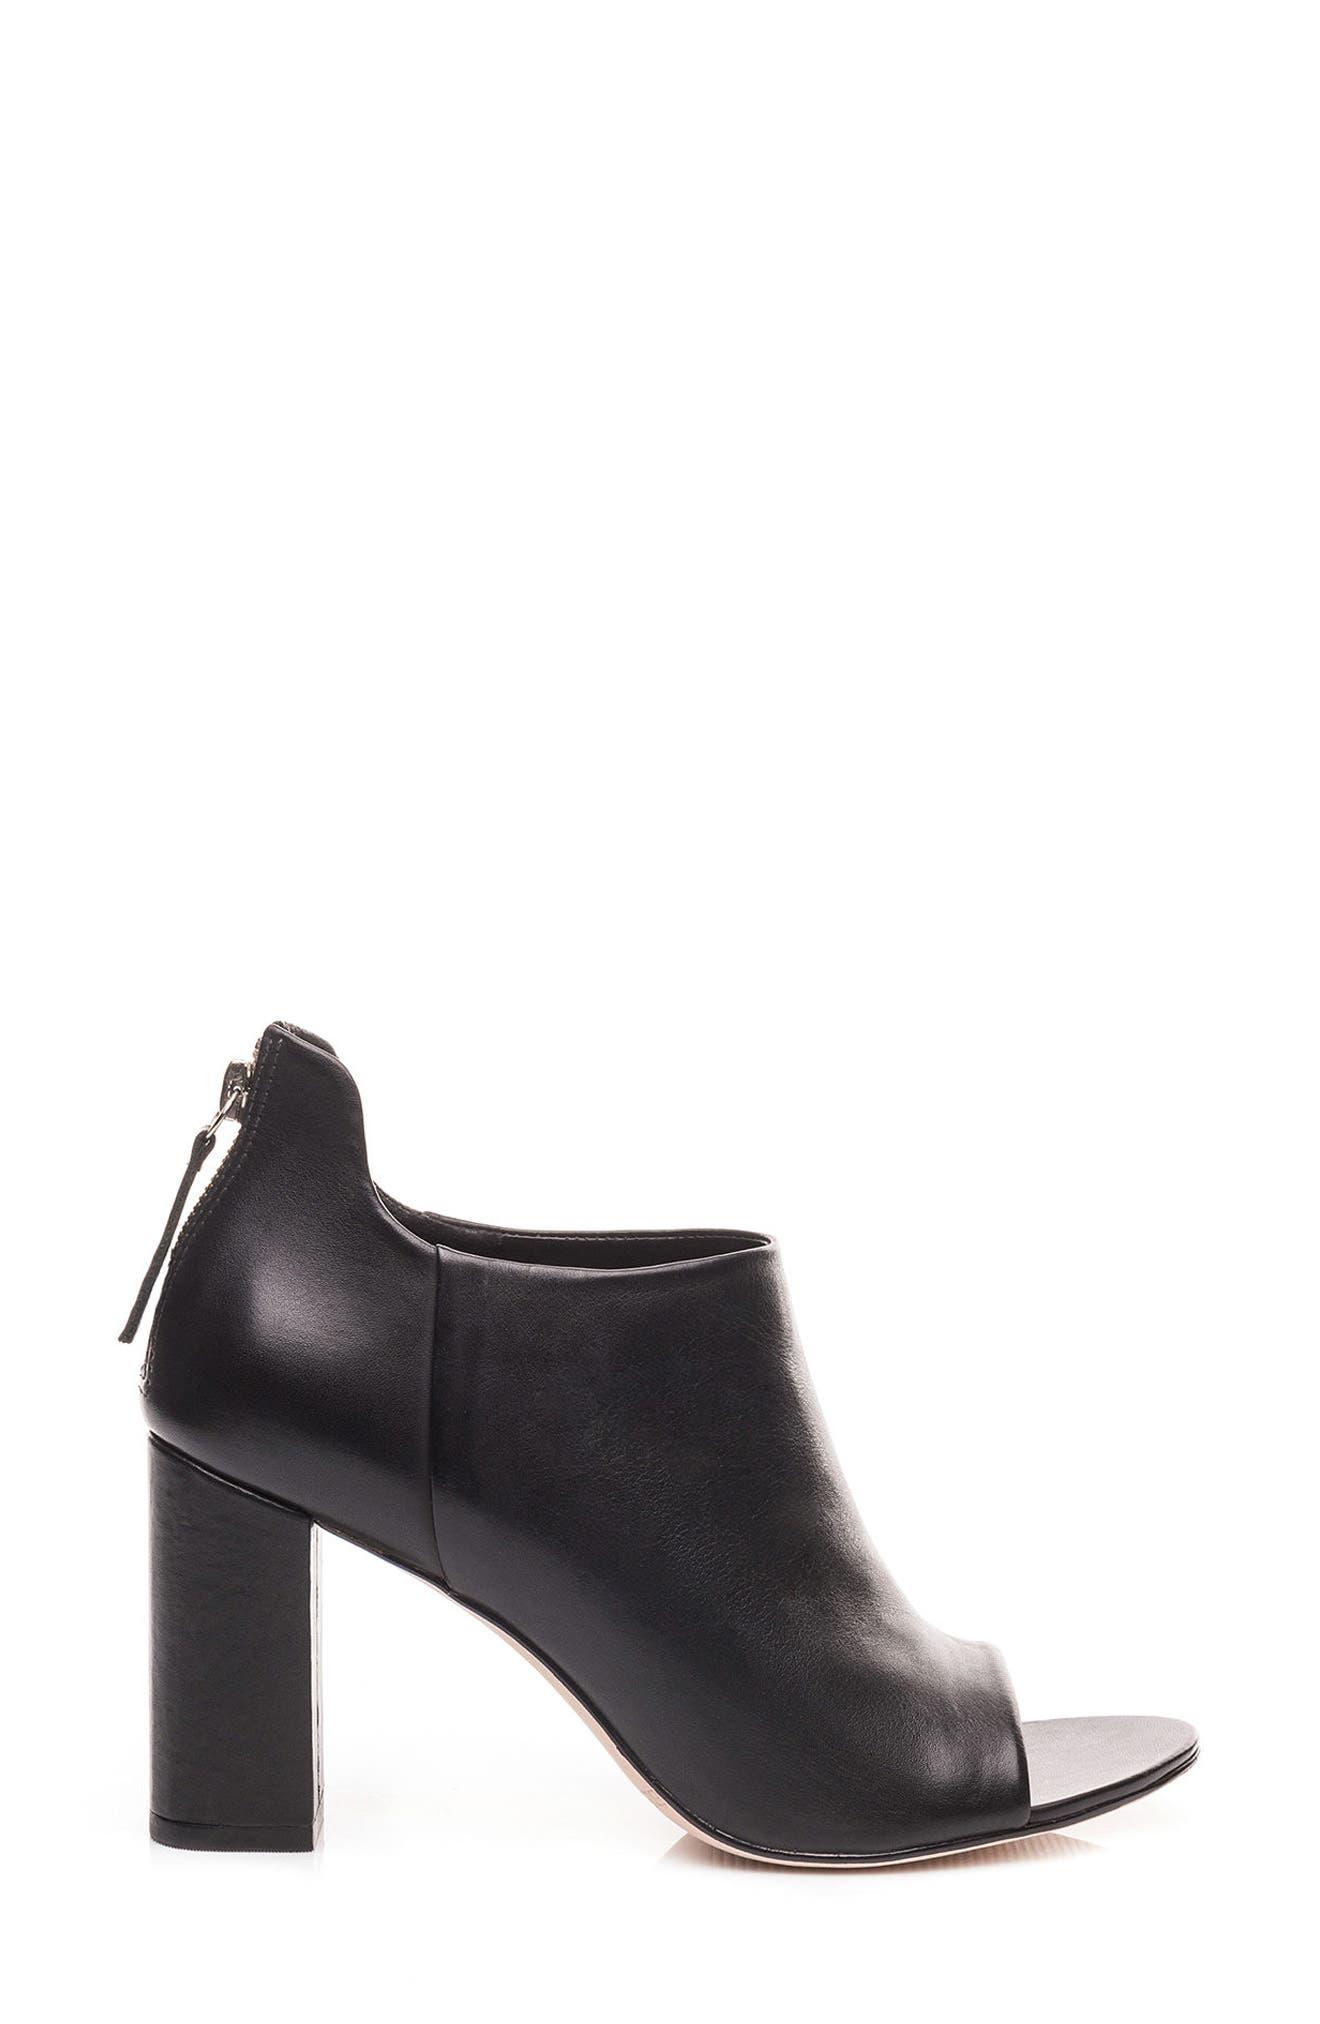 Heather Peep Toe Bootie,                             Alternate thumbnail 3, color,                             Black Leather